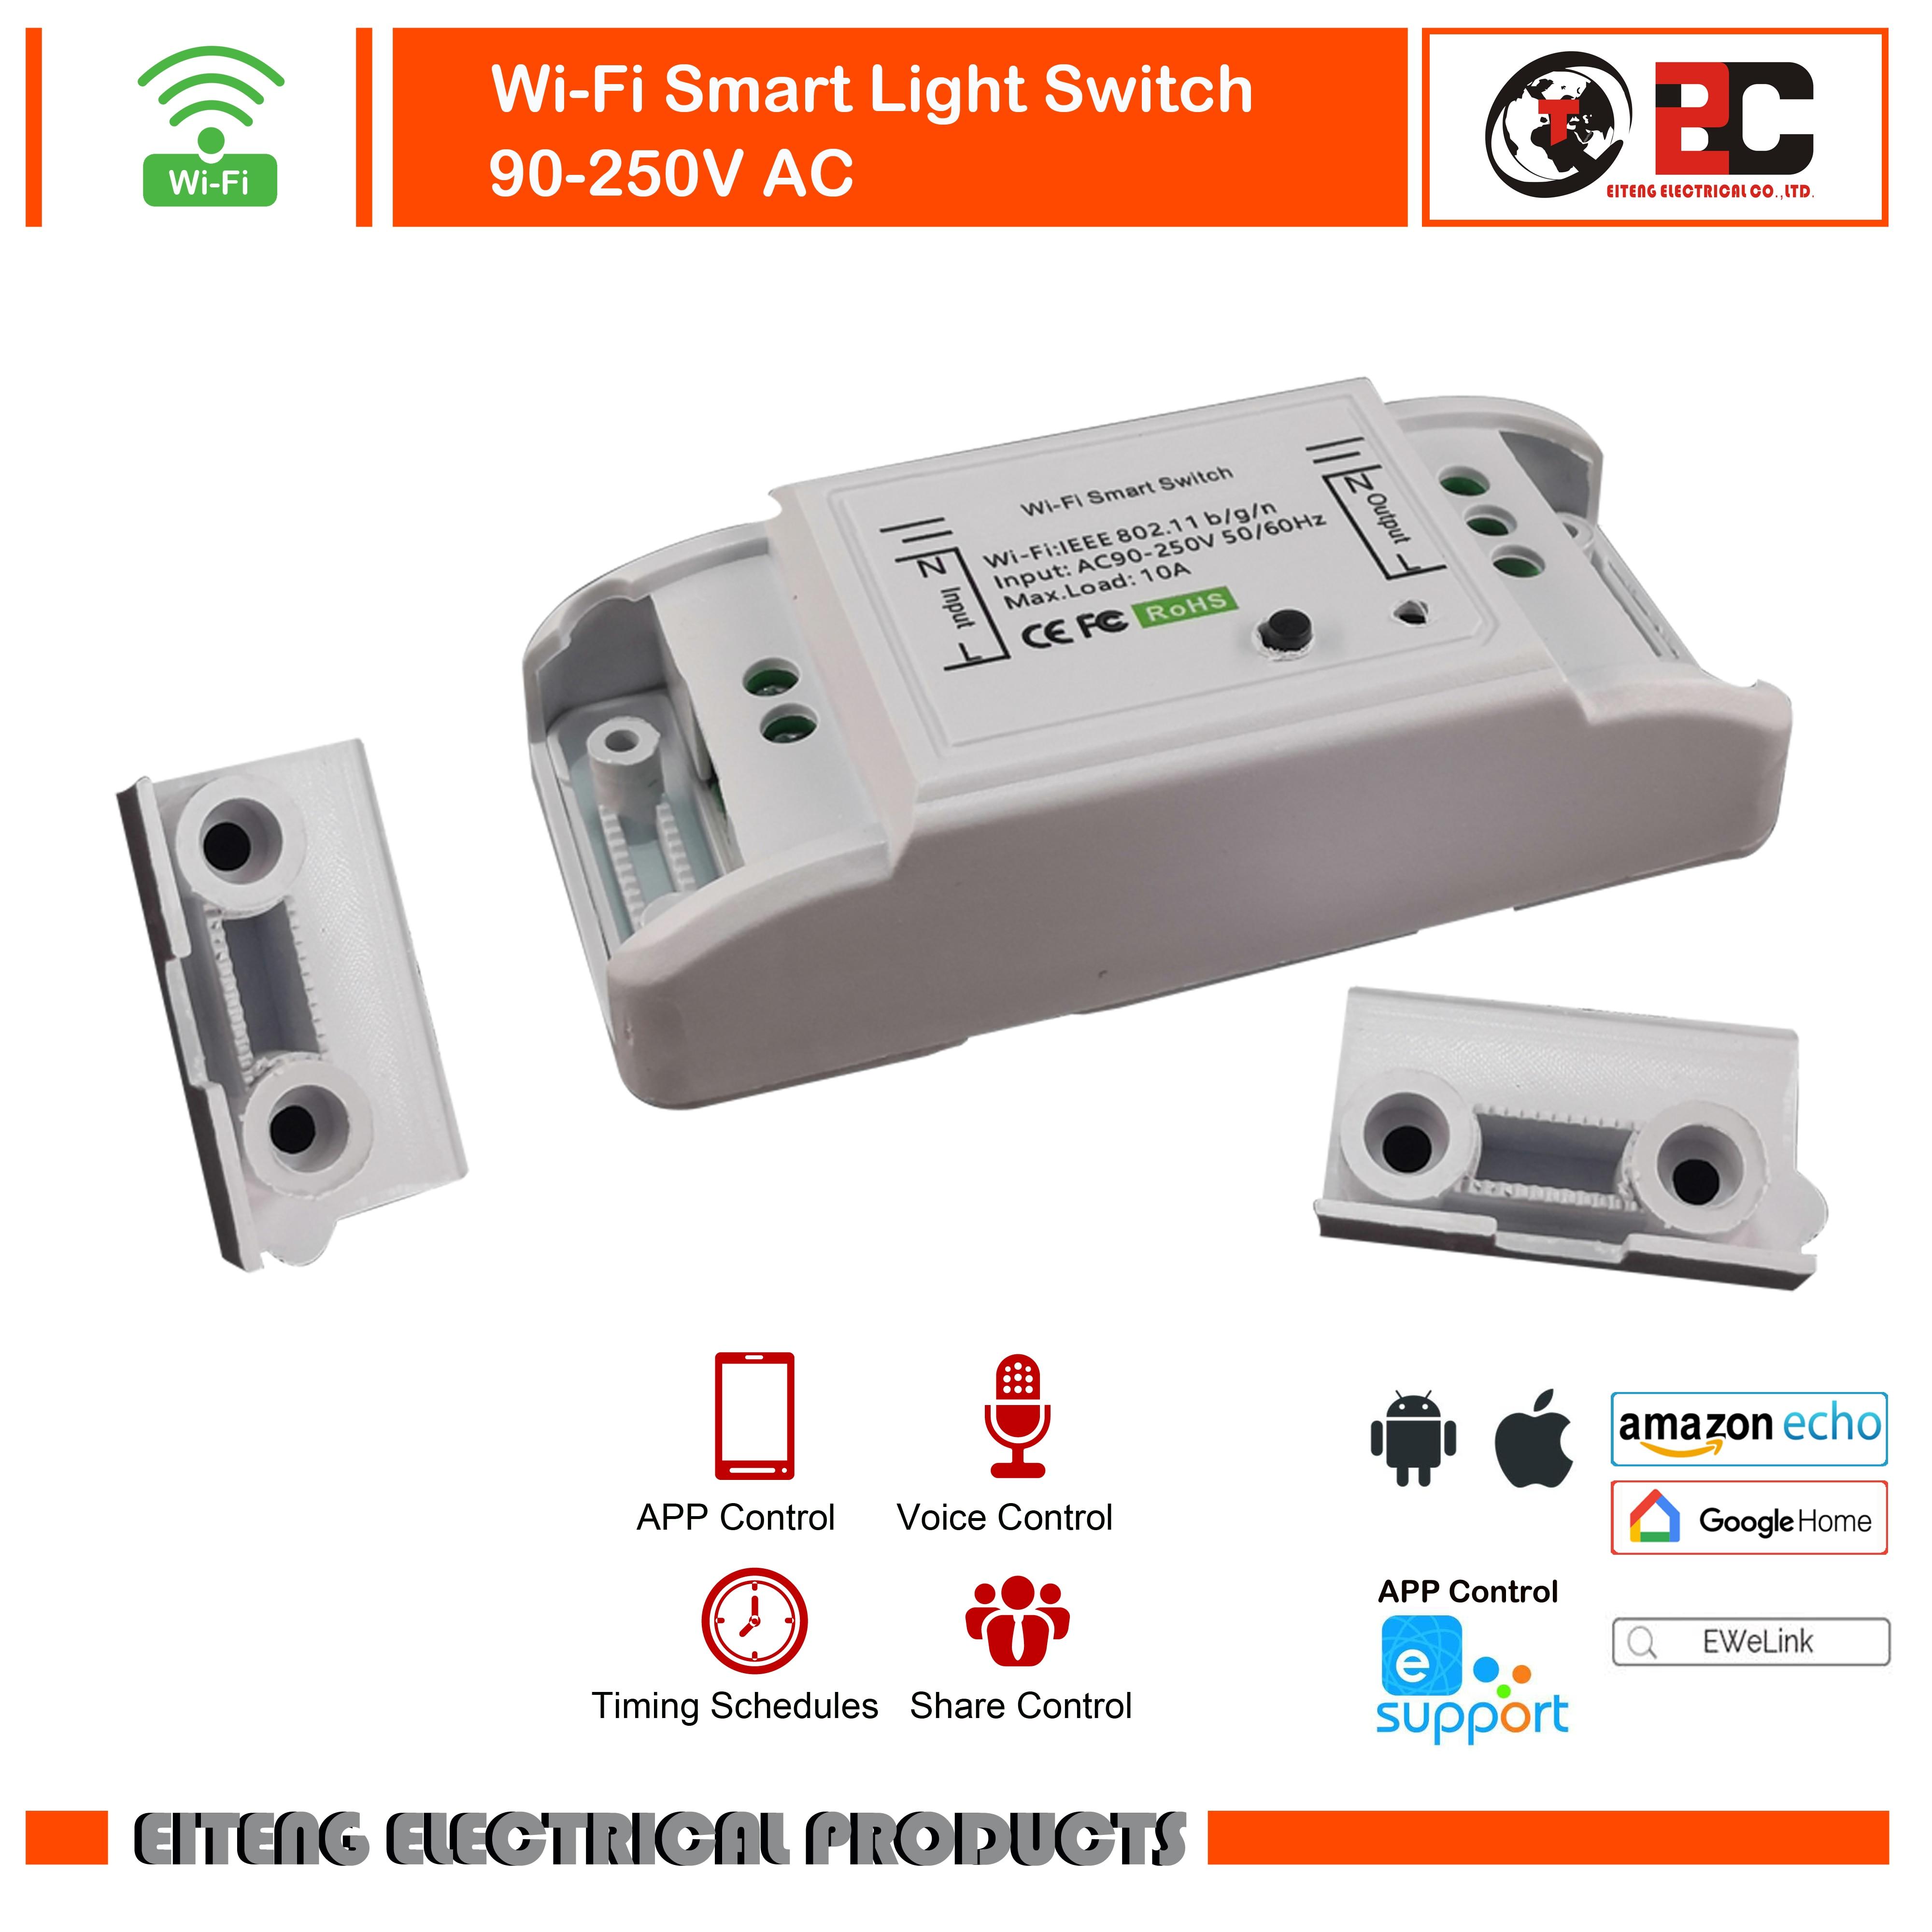 Ultimate SaleDIY WiFi Smart Light Switch Universal Breaker Timer Smart Life APP Wireless Remote Control Works with Google Home Alexa